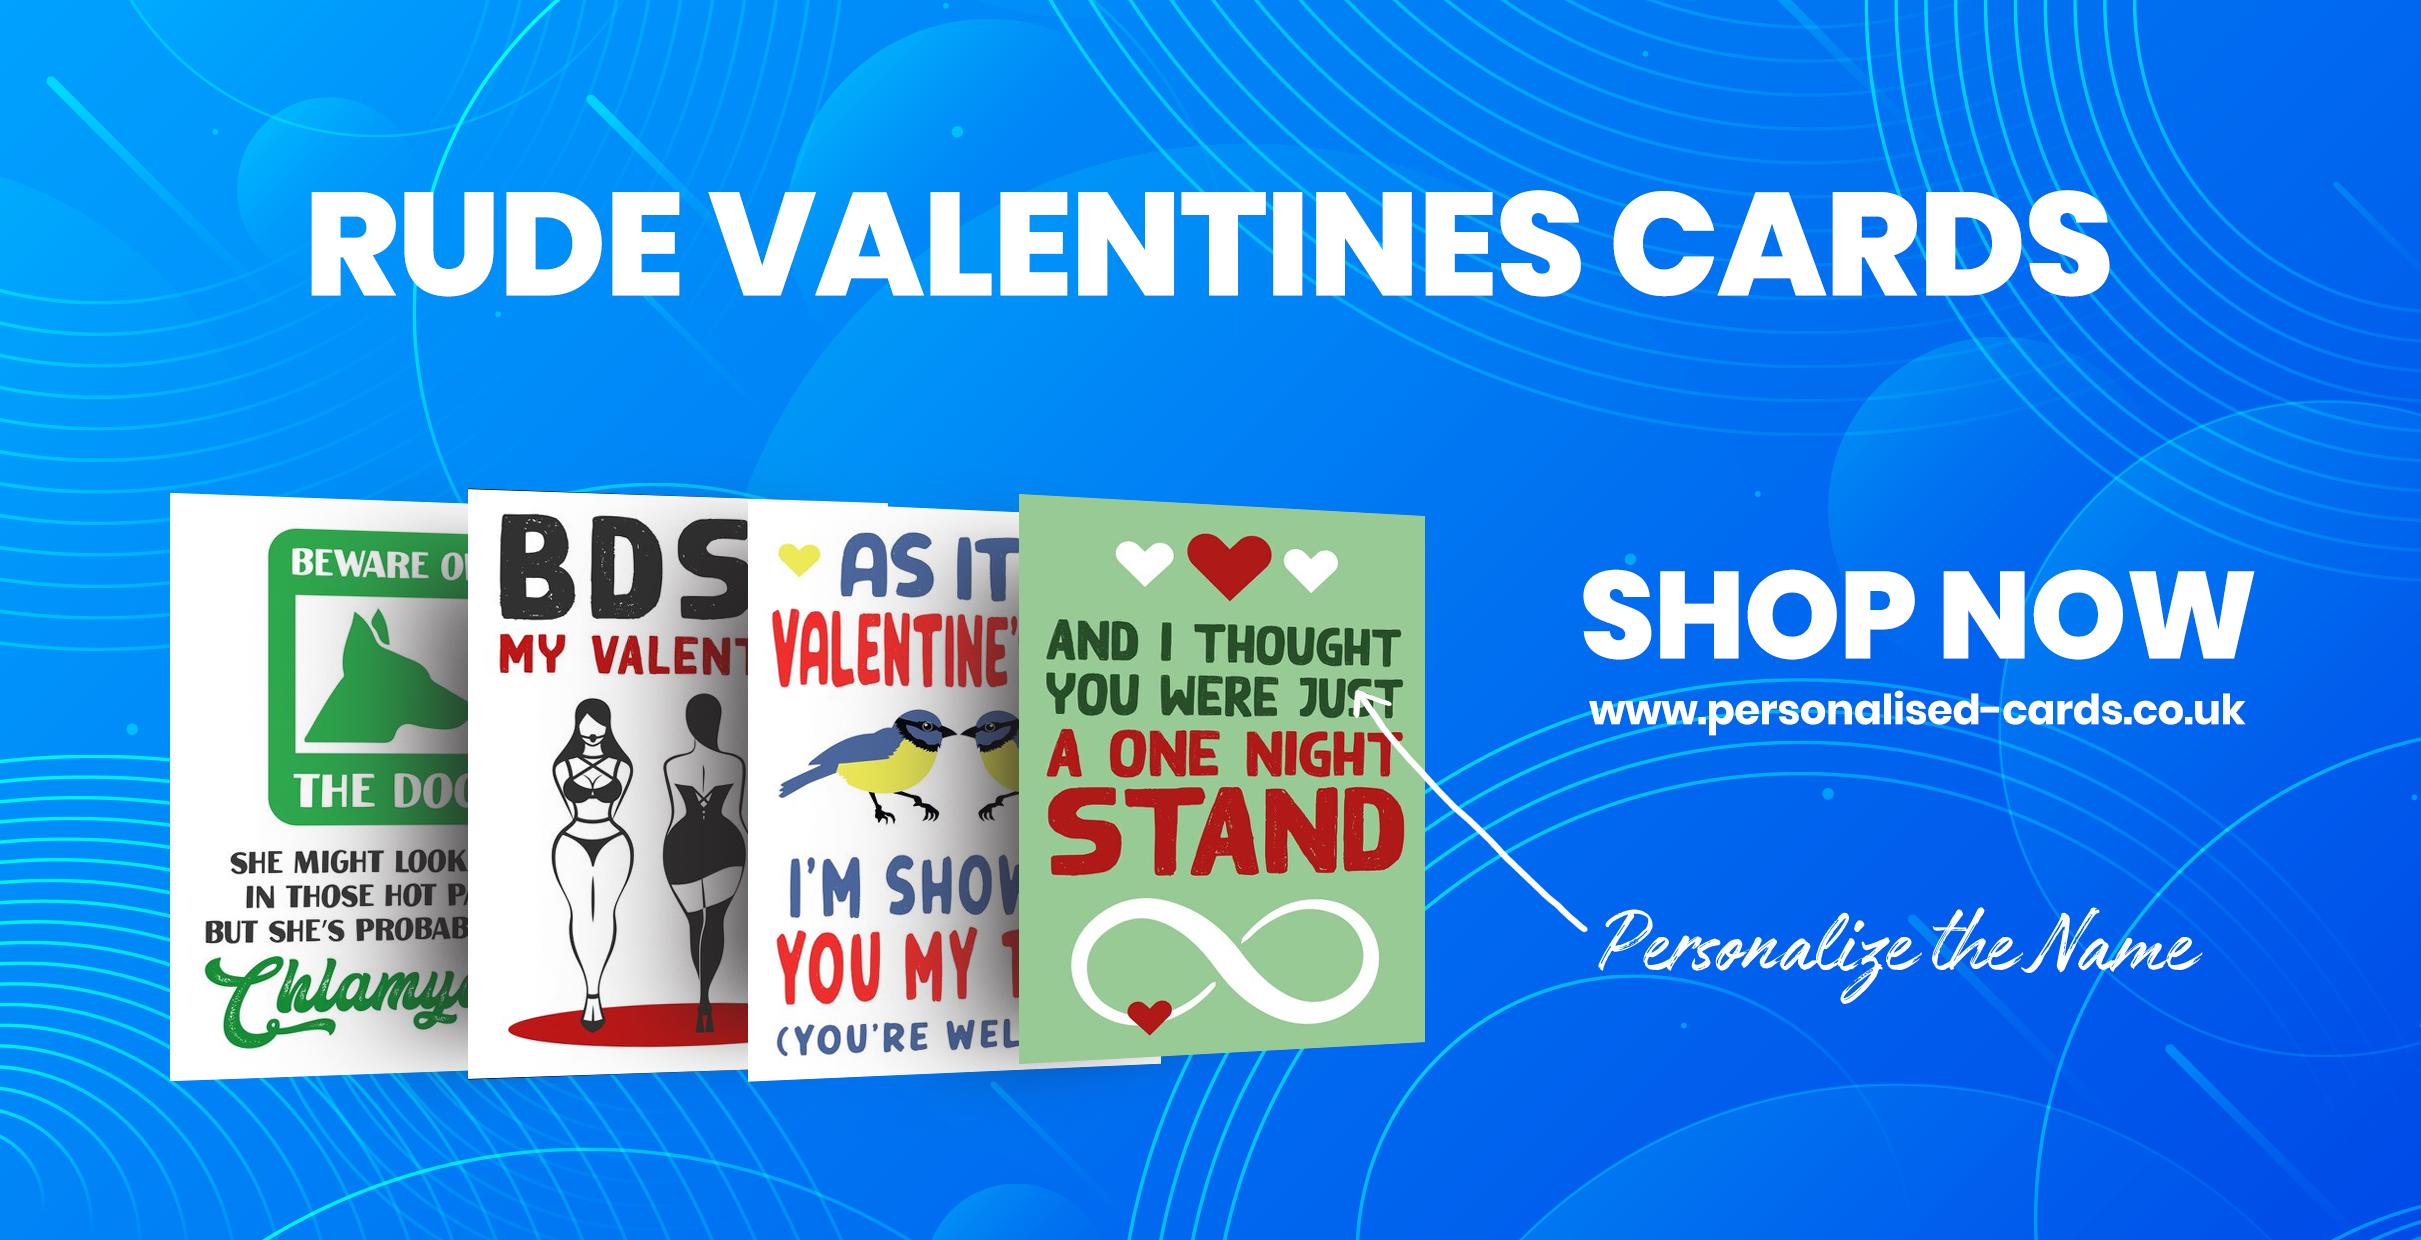 rude-valentines-cards.jpg